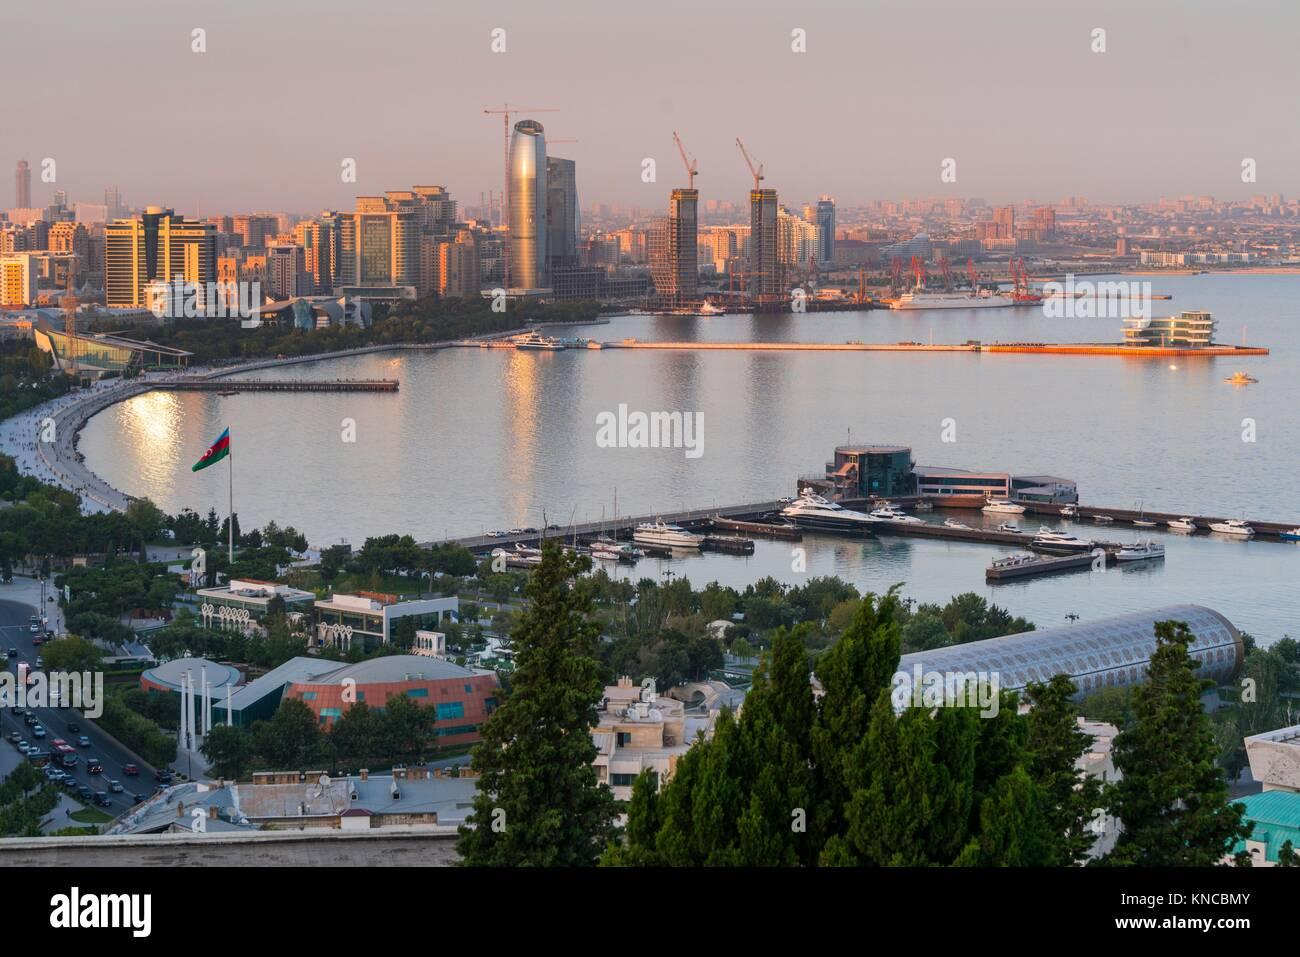 Baku City, Azerbaijan, Middle East. - Stock Image